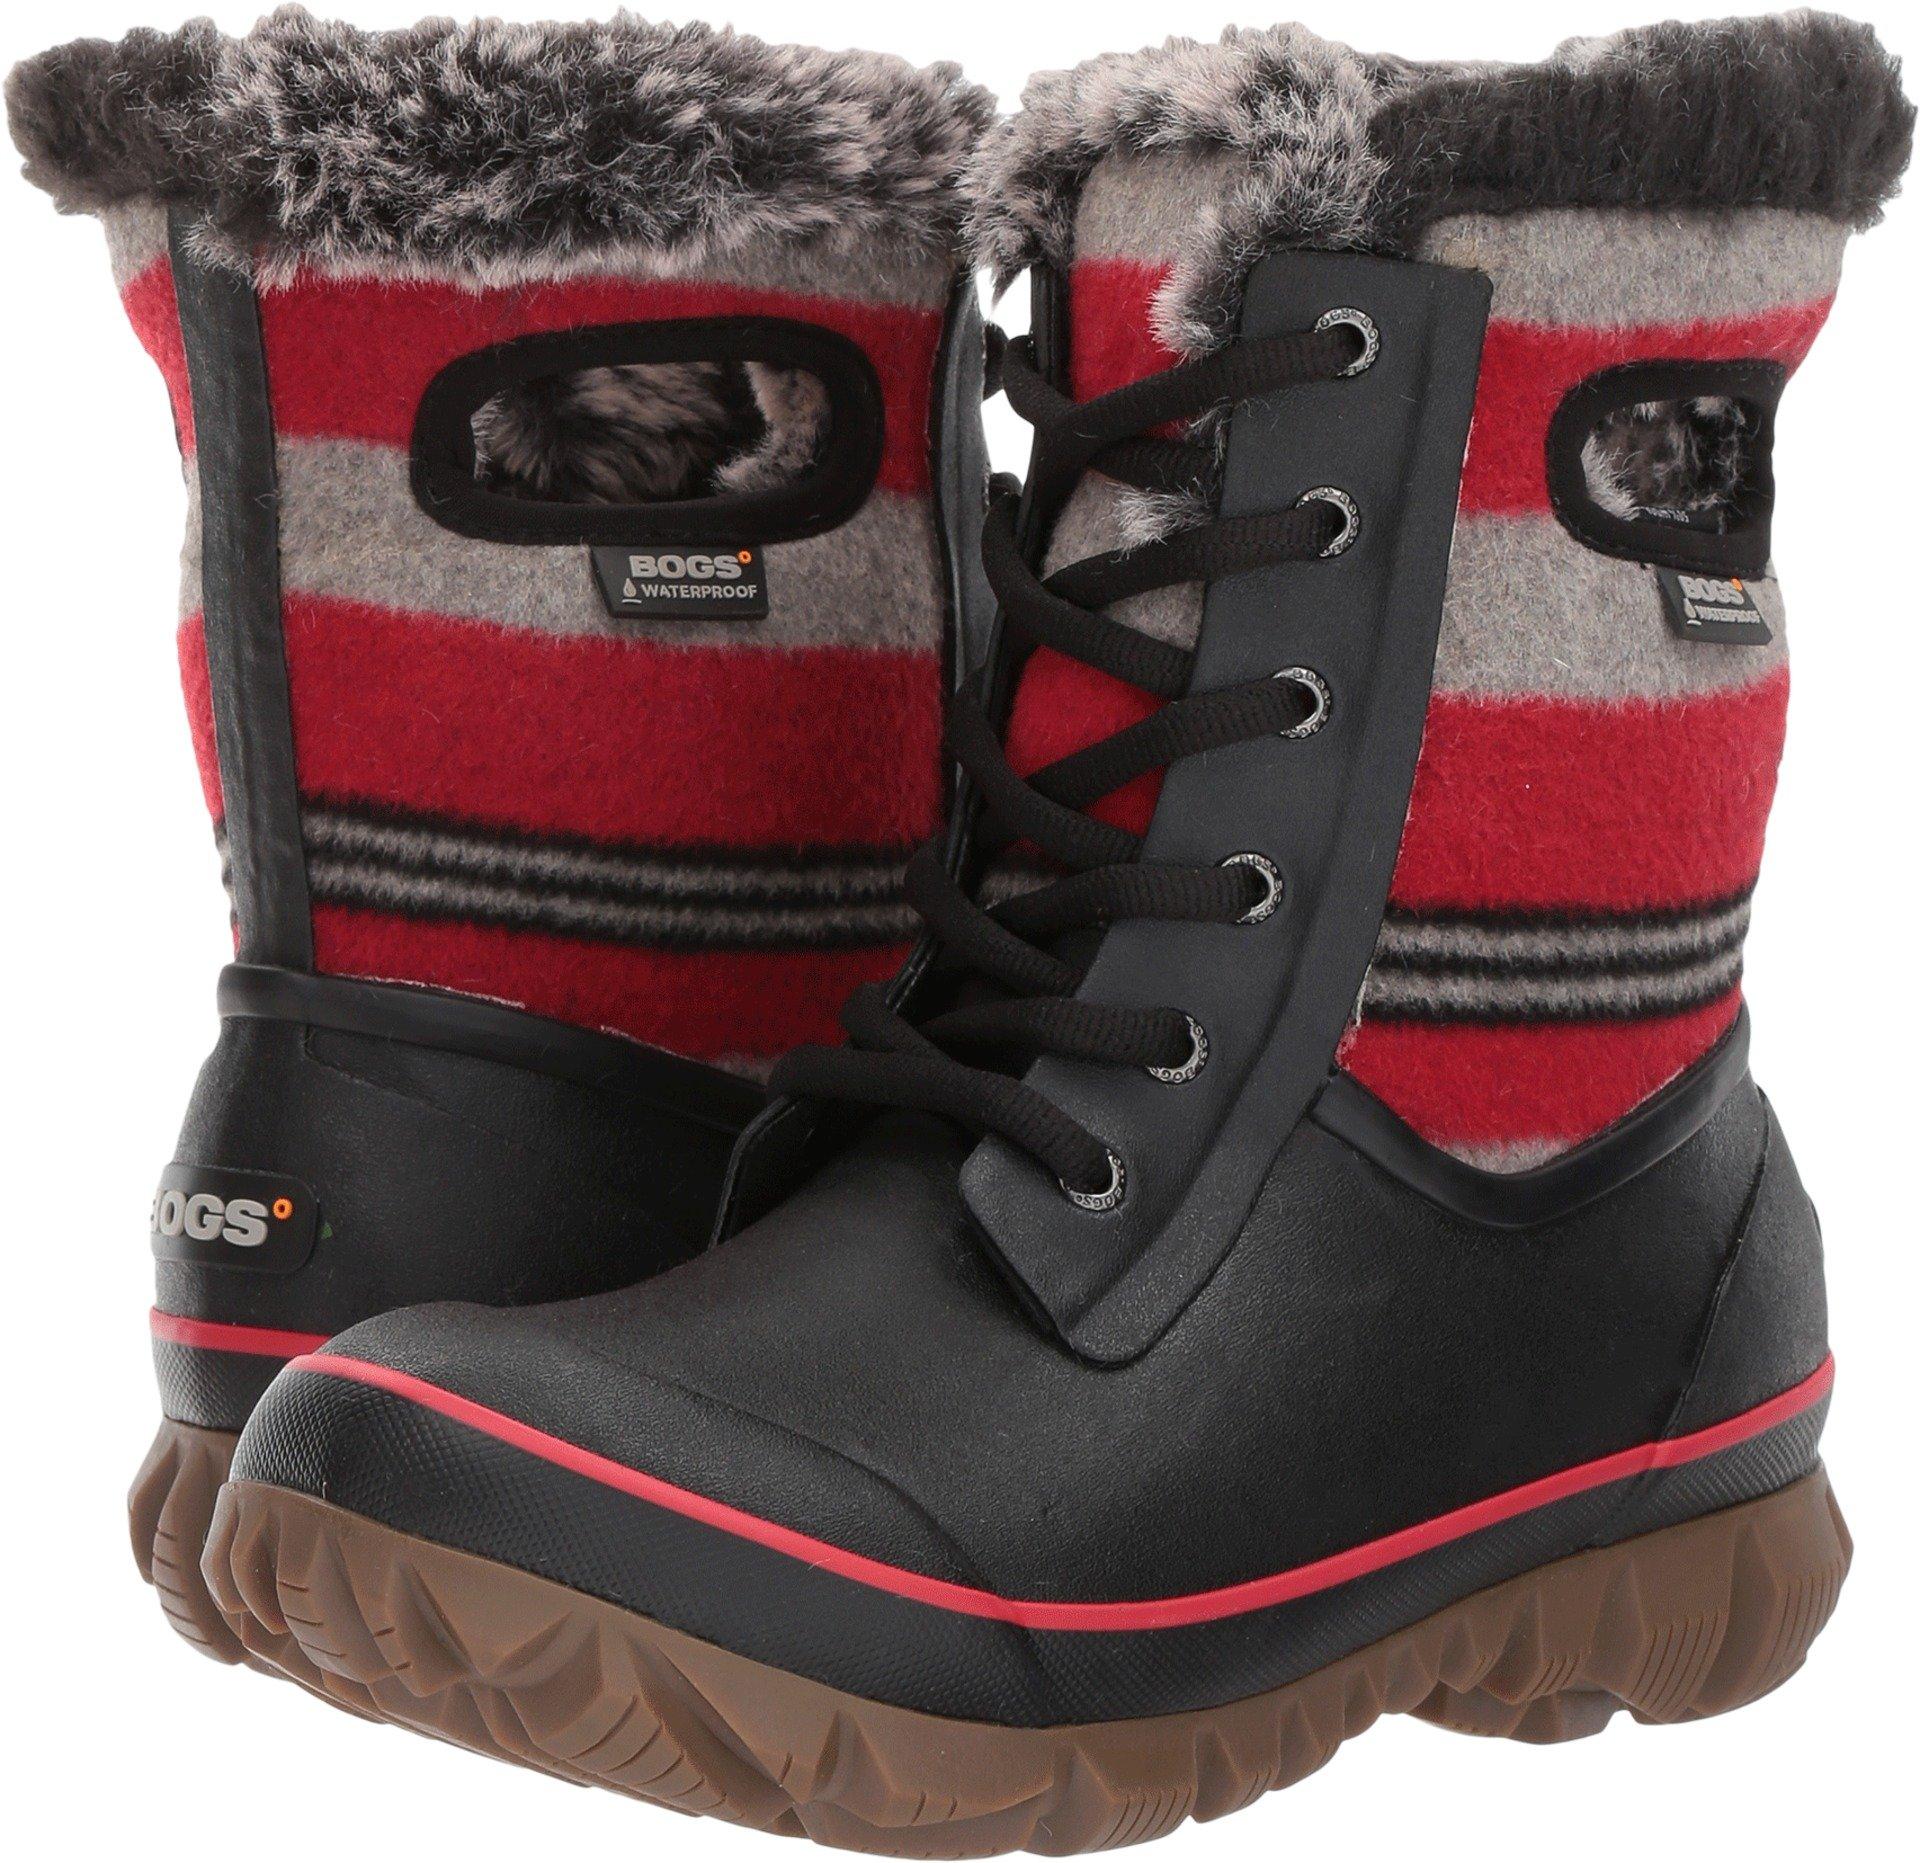 Bogs Arcata Sripe Boot - Women's Red Multi, 11.0